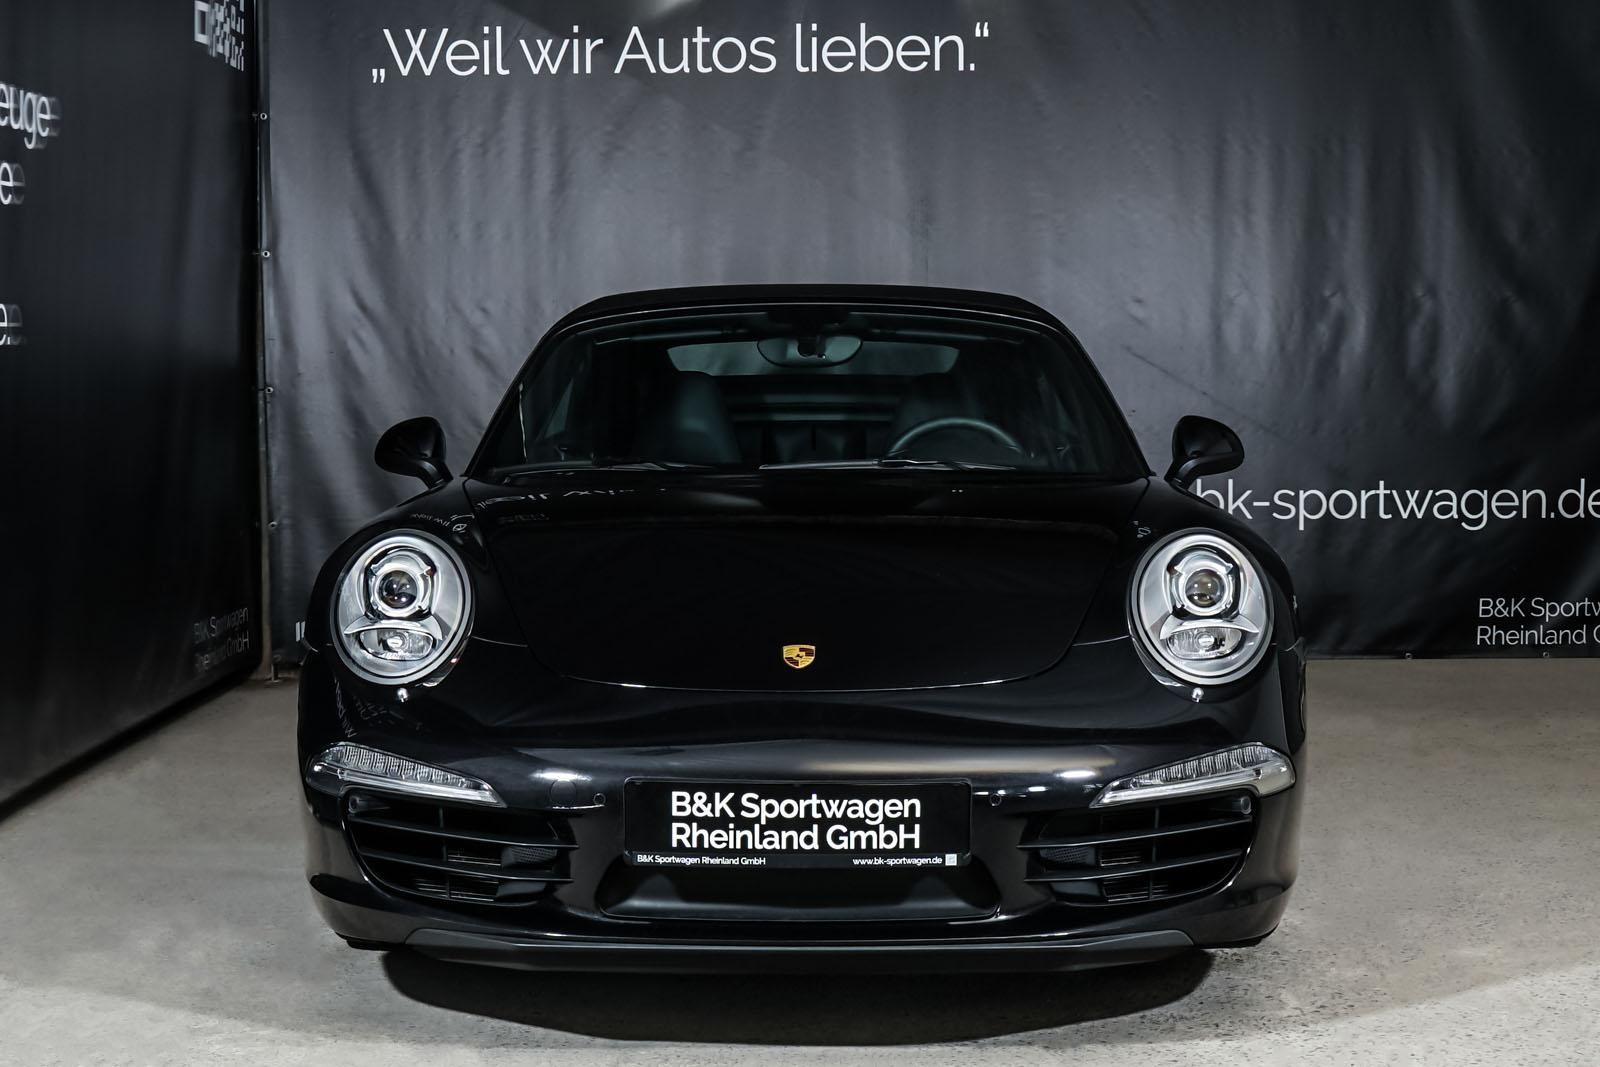 Porsche_991_CarreraS_Cabrio_Schwarz_Schwarz_POR-7555_1_w